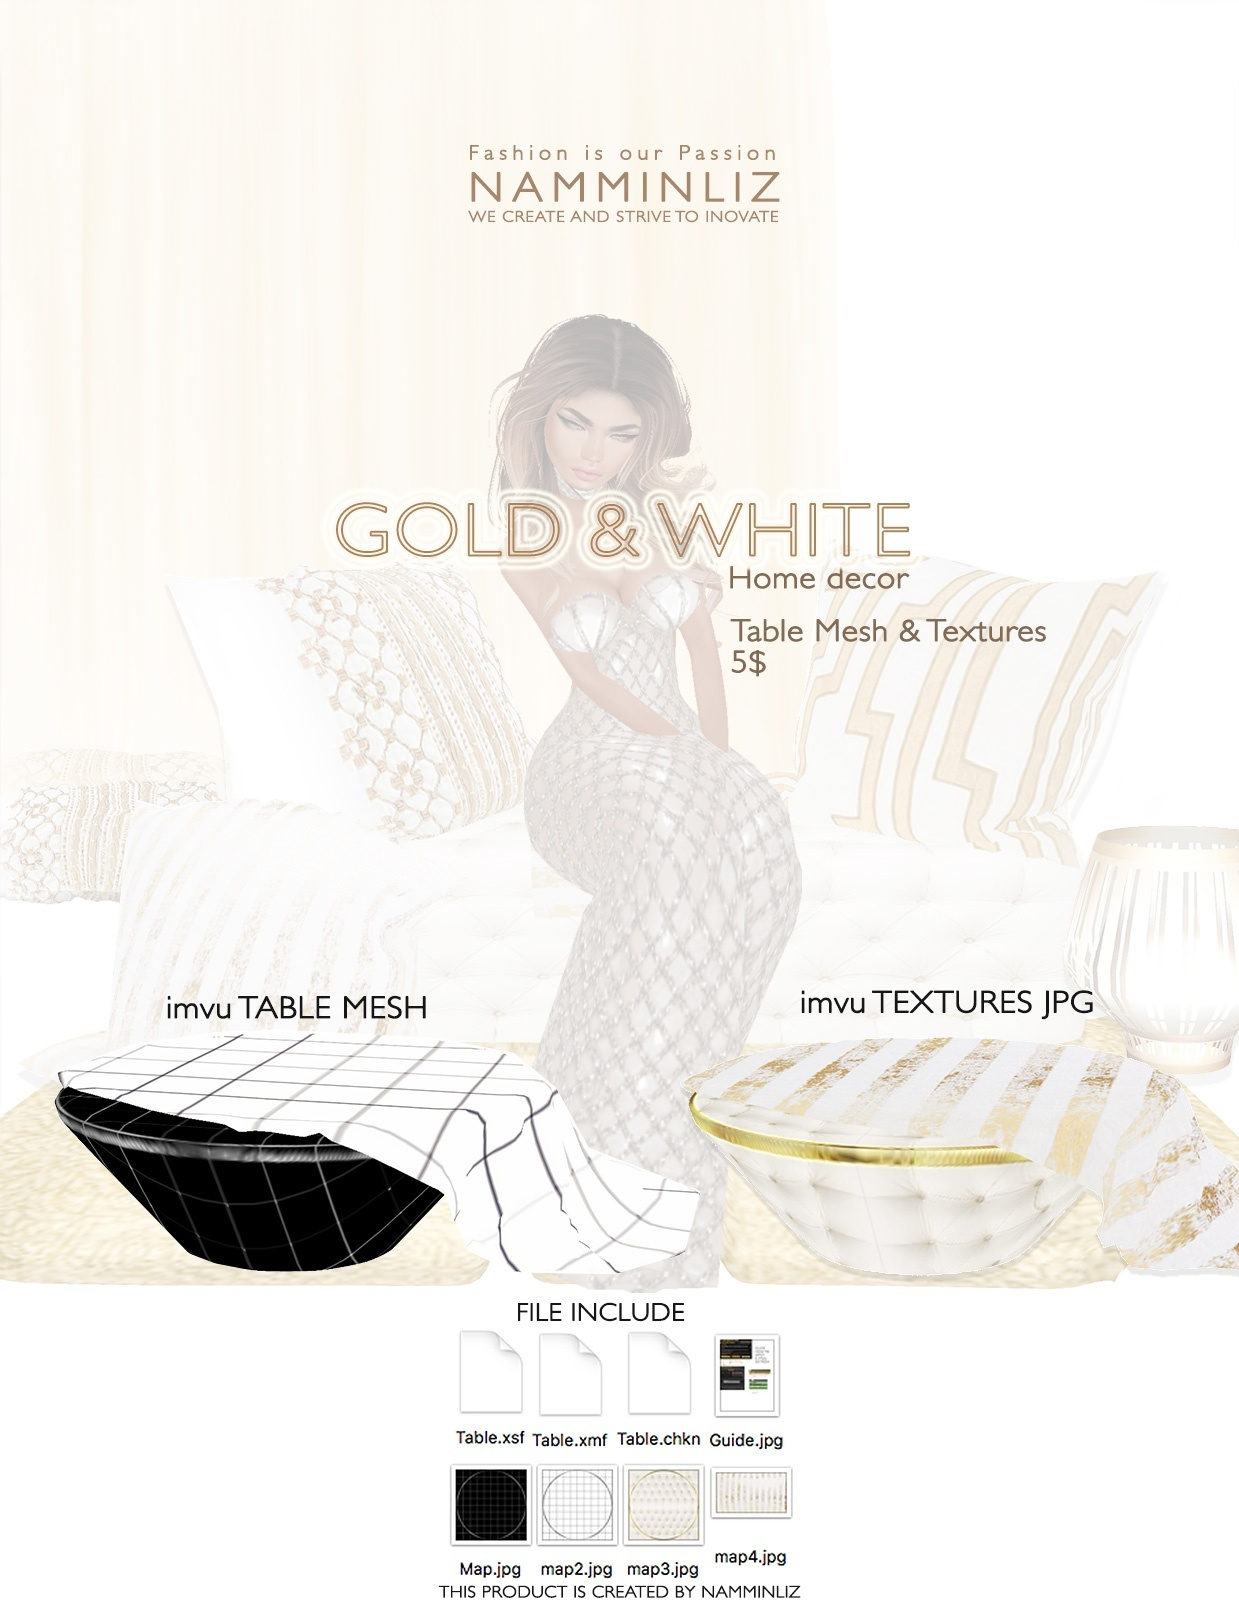 Gold & White imvu Table mesh & texture JPG, XSF, XMF, CHKN files